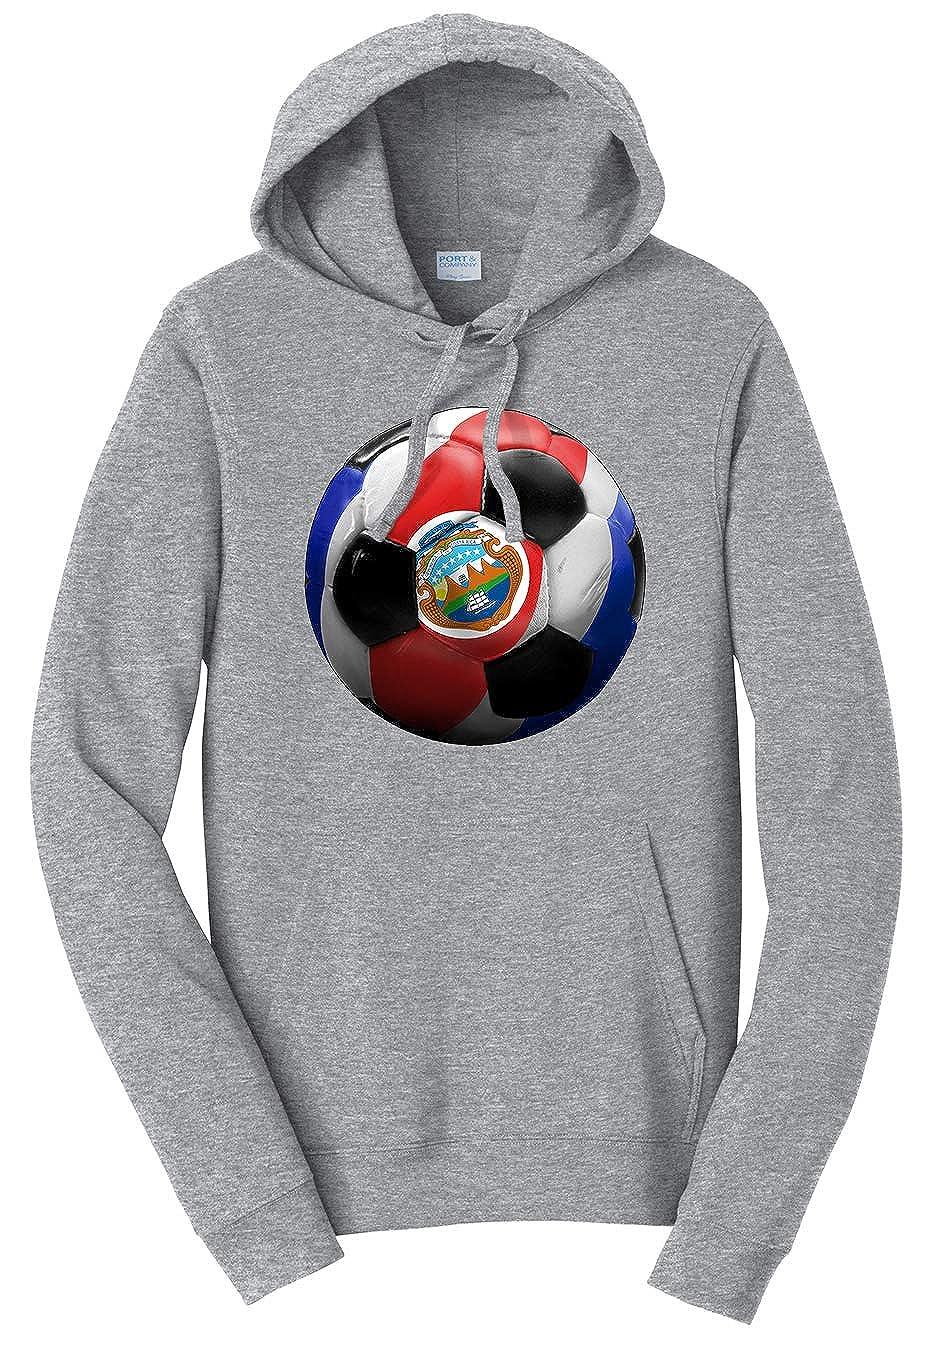 Tenacitee Unisex Costa Rica Soccer Sweatshirt